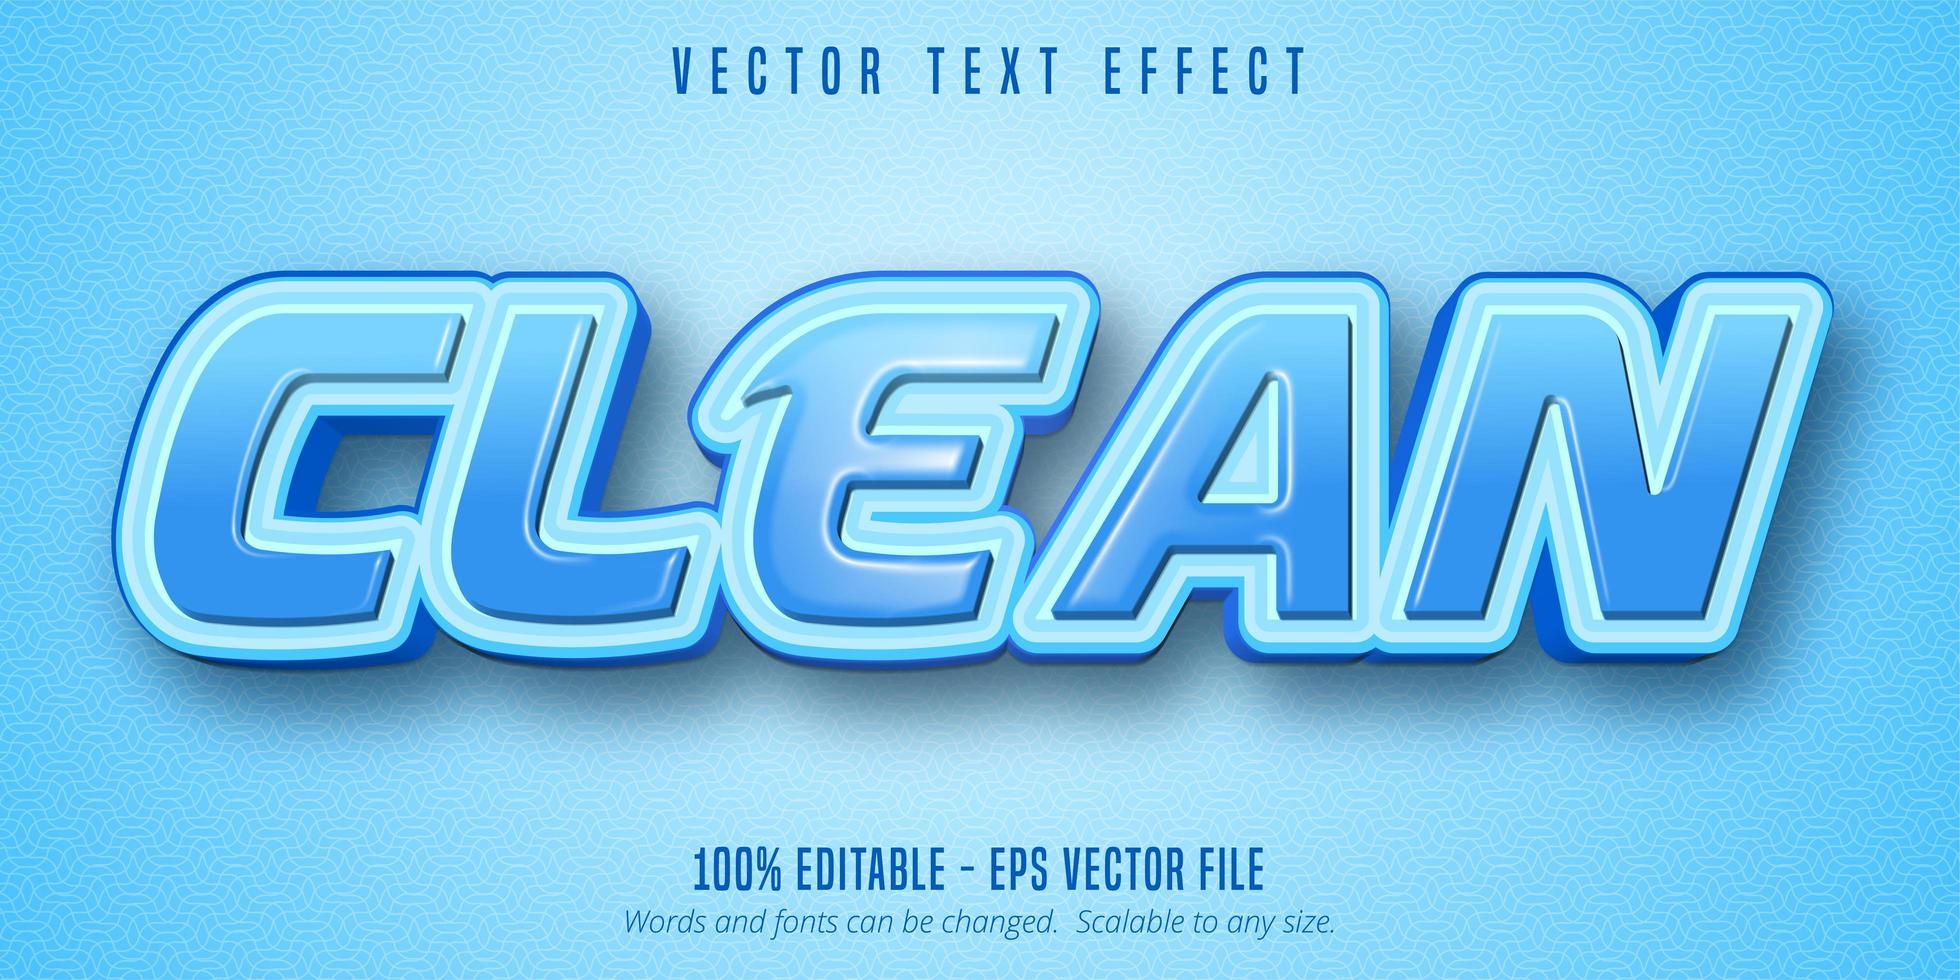 schoon glanzend blauw geschetst teksteffect vector